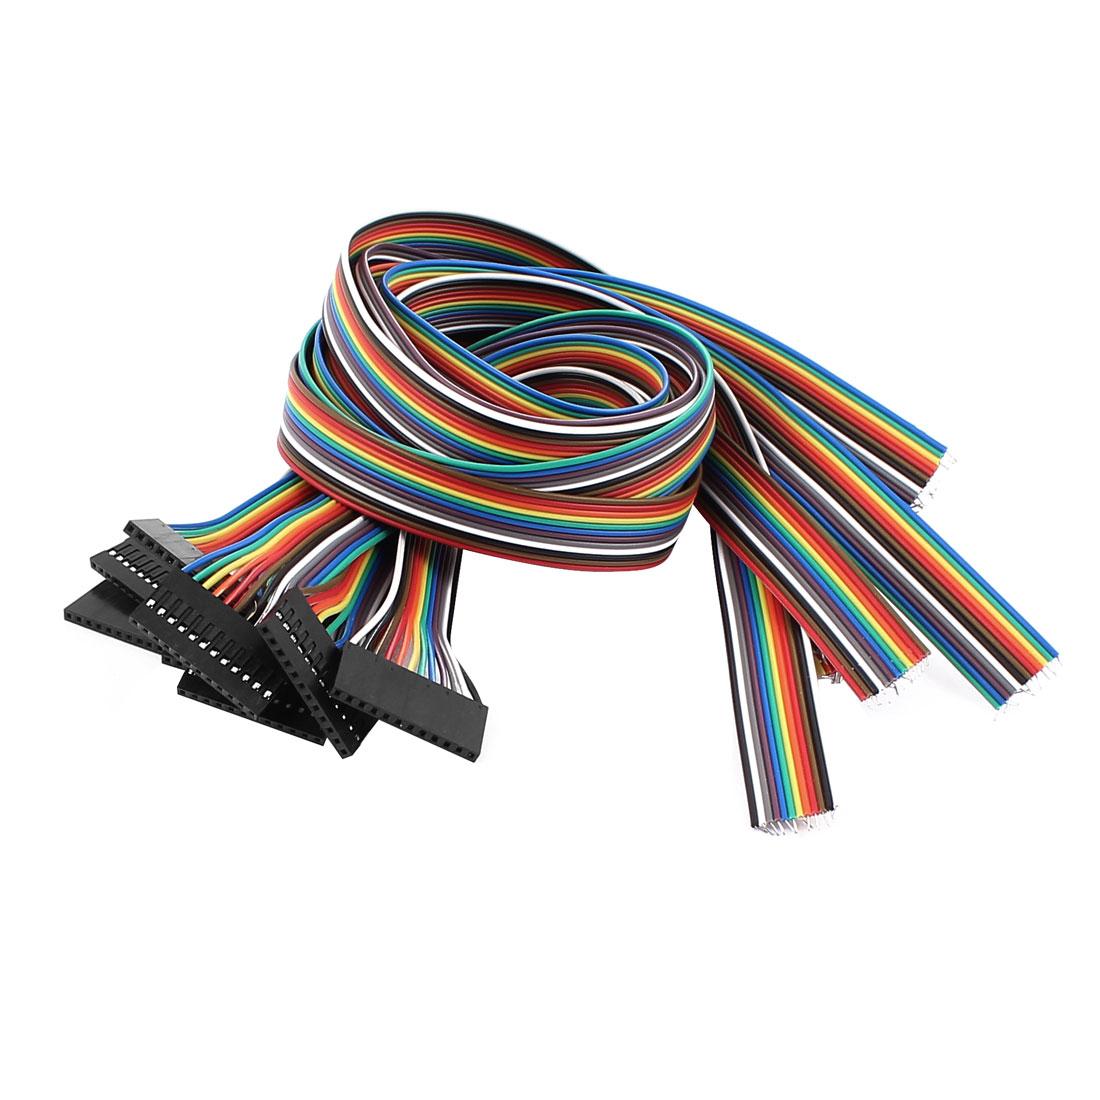 10 Pcs 12P Jumper Wires Female Ribbon Cables Pi Pic Breadboard 50cm Long